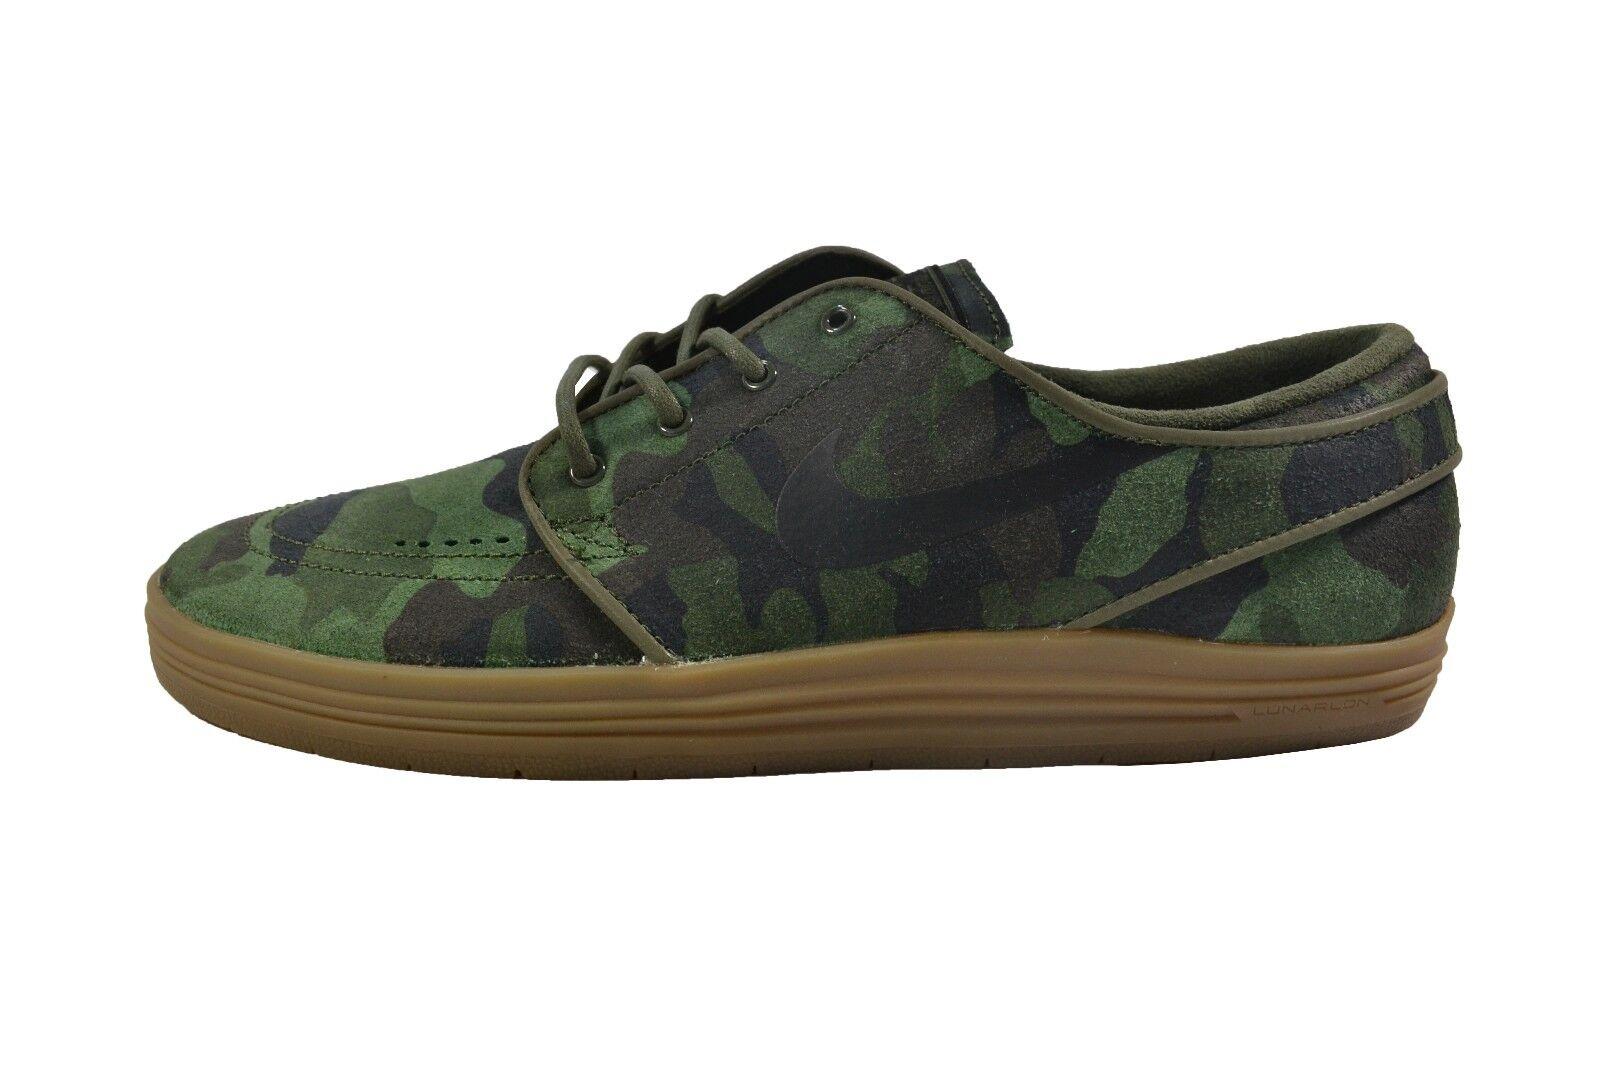 Nike LUNAR STEFAN JANOSKI QS QS JANOSKI Cargo Khaki noir Discounted (424) homme chaussures 01da57